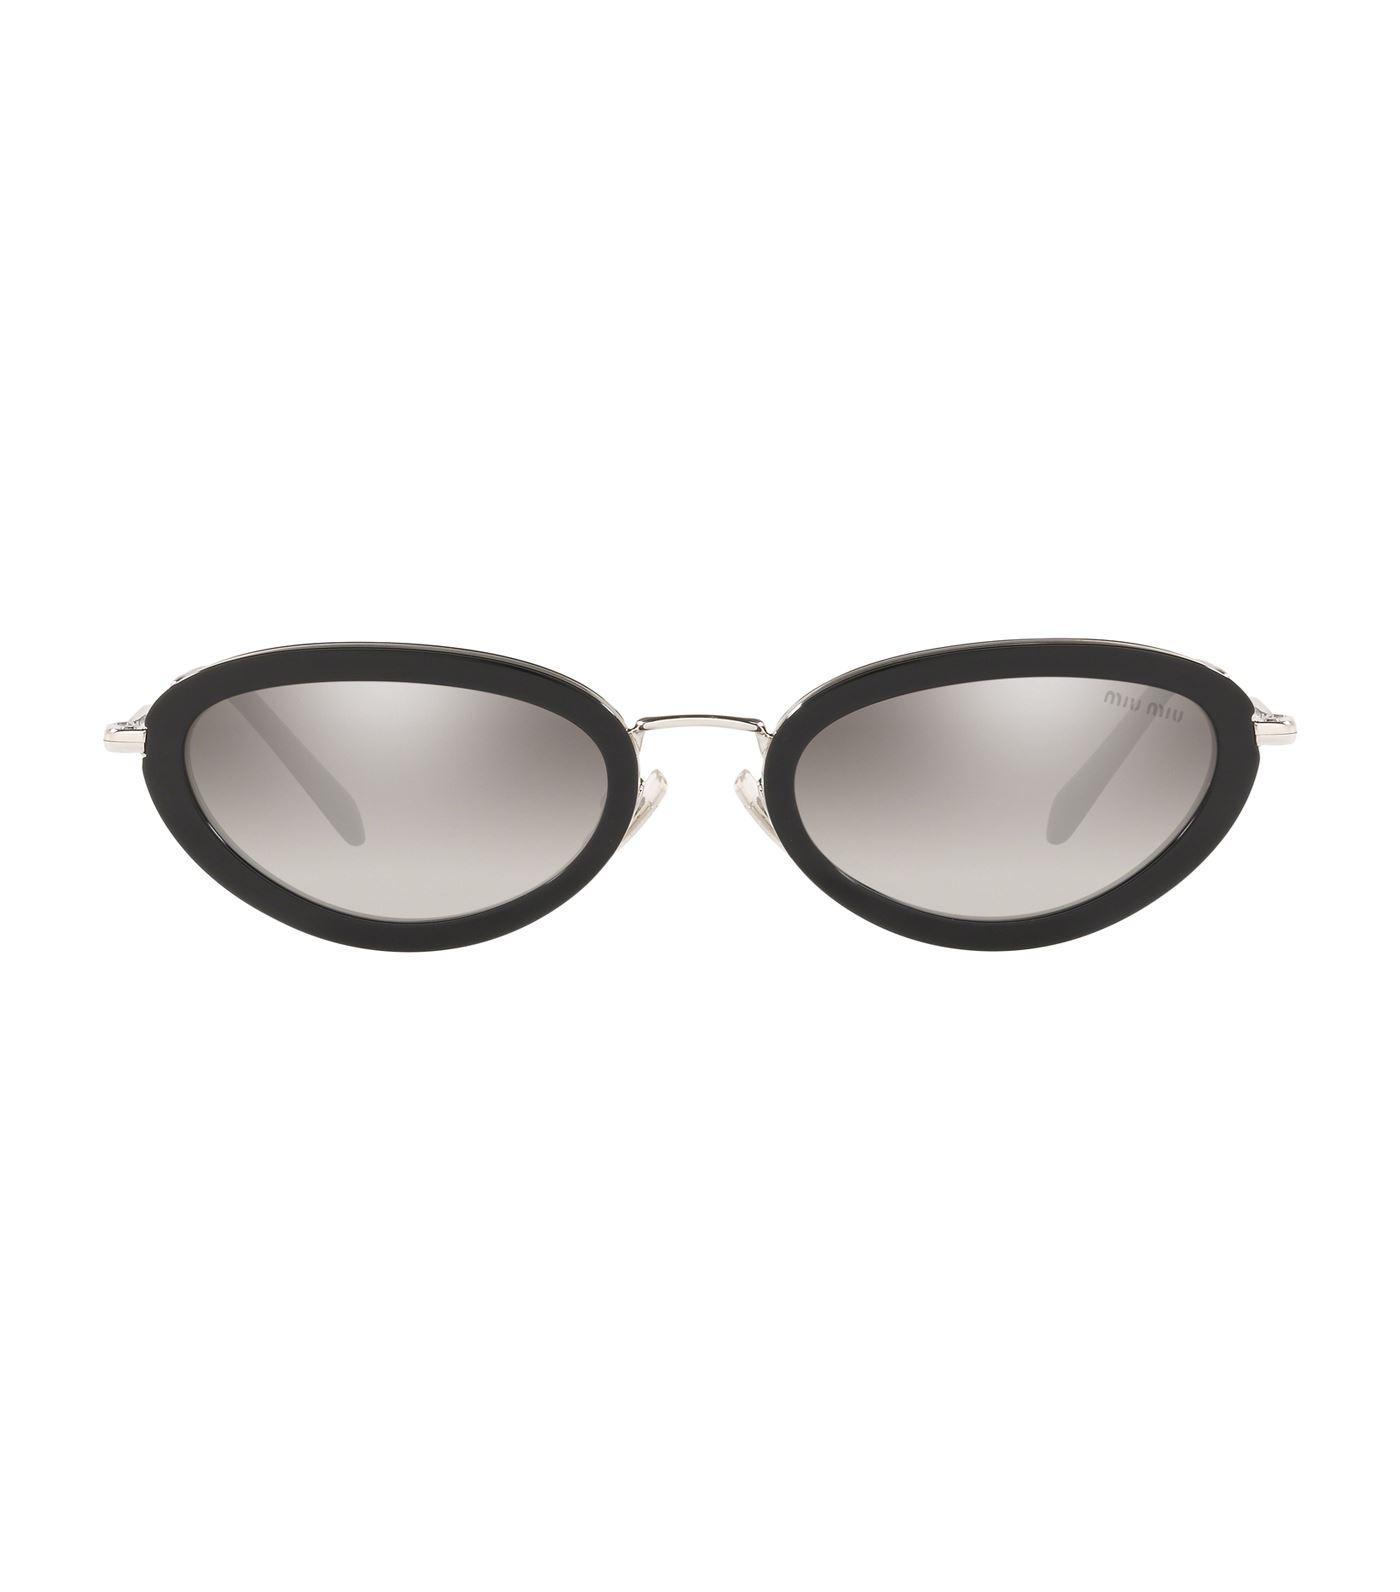 181371d8368d1 Miu Miu Dlice Oval Sunglasses in Black - Lyst